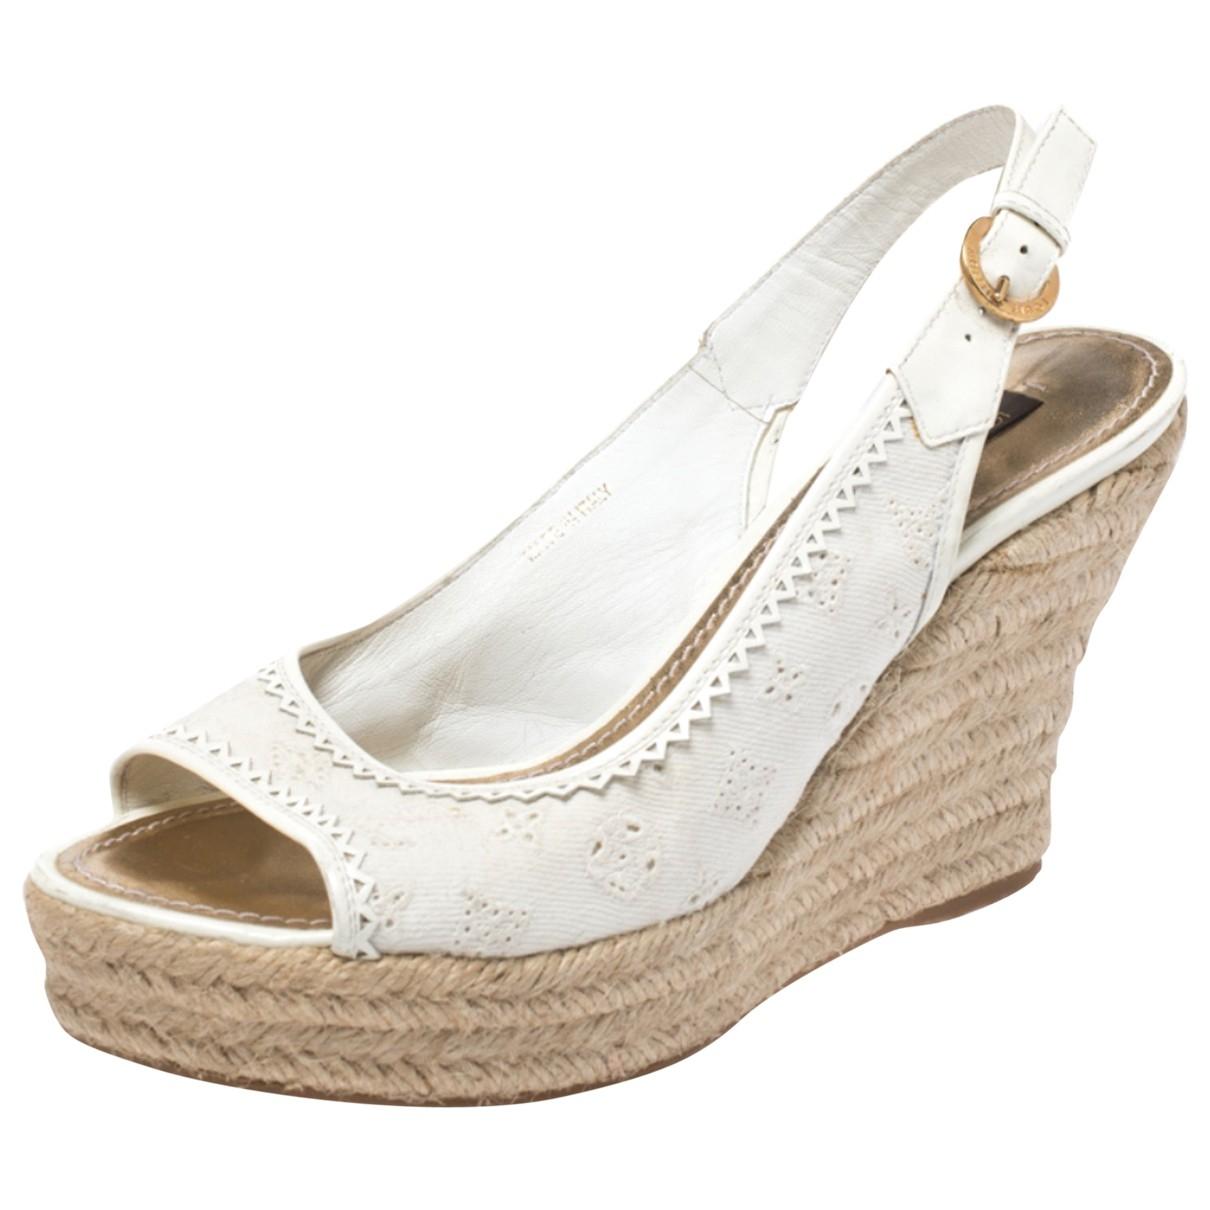 Louis Vuitton \N Sandalen in  Weiss Lackleder